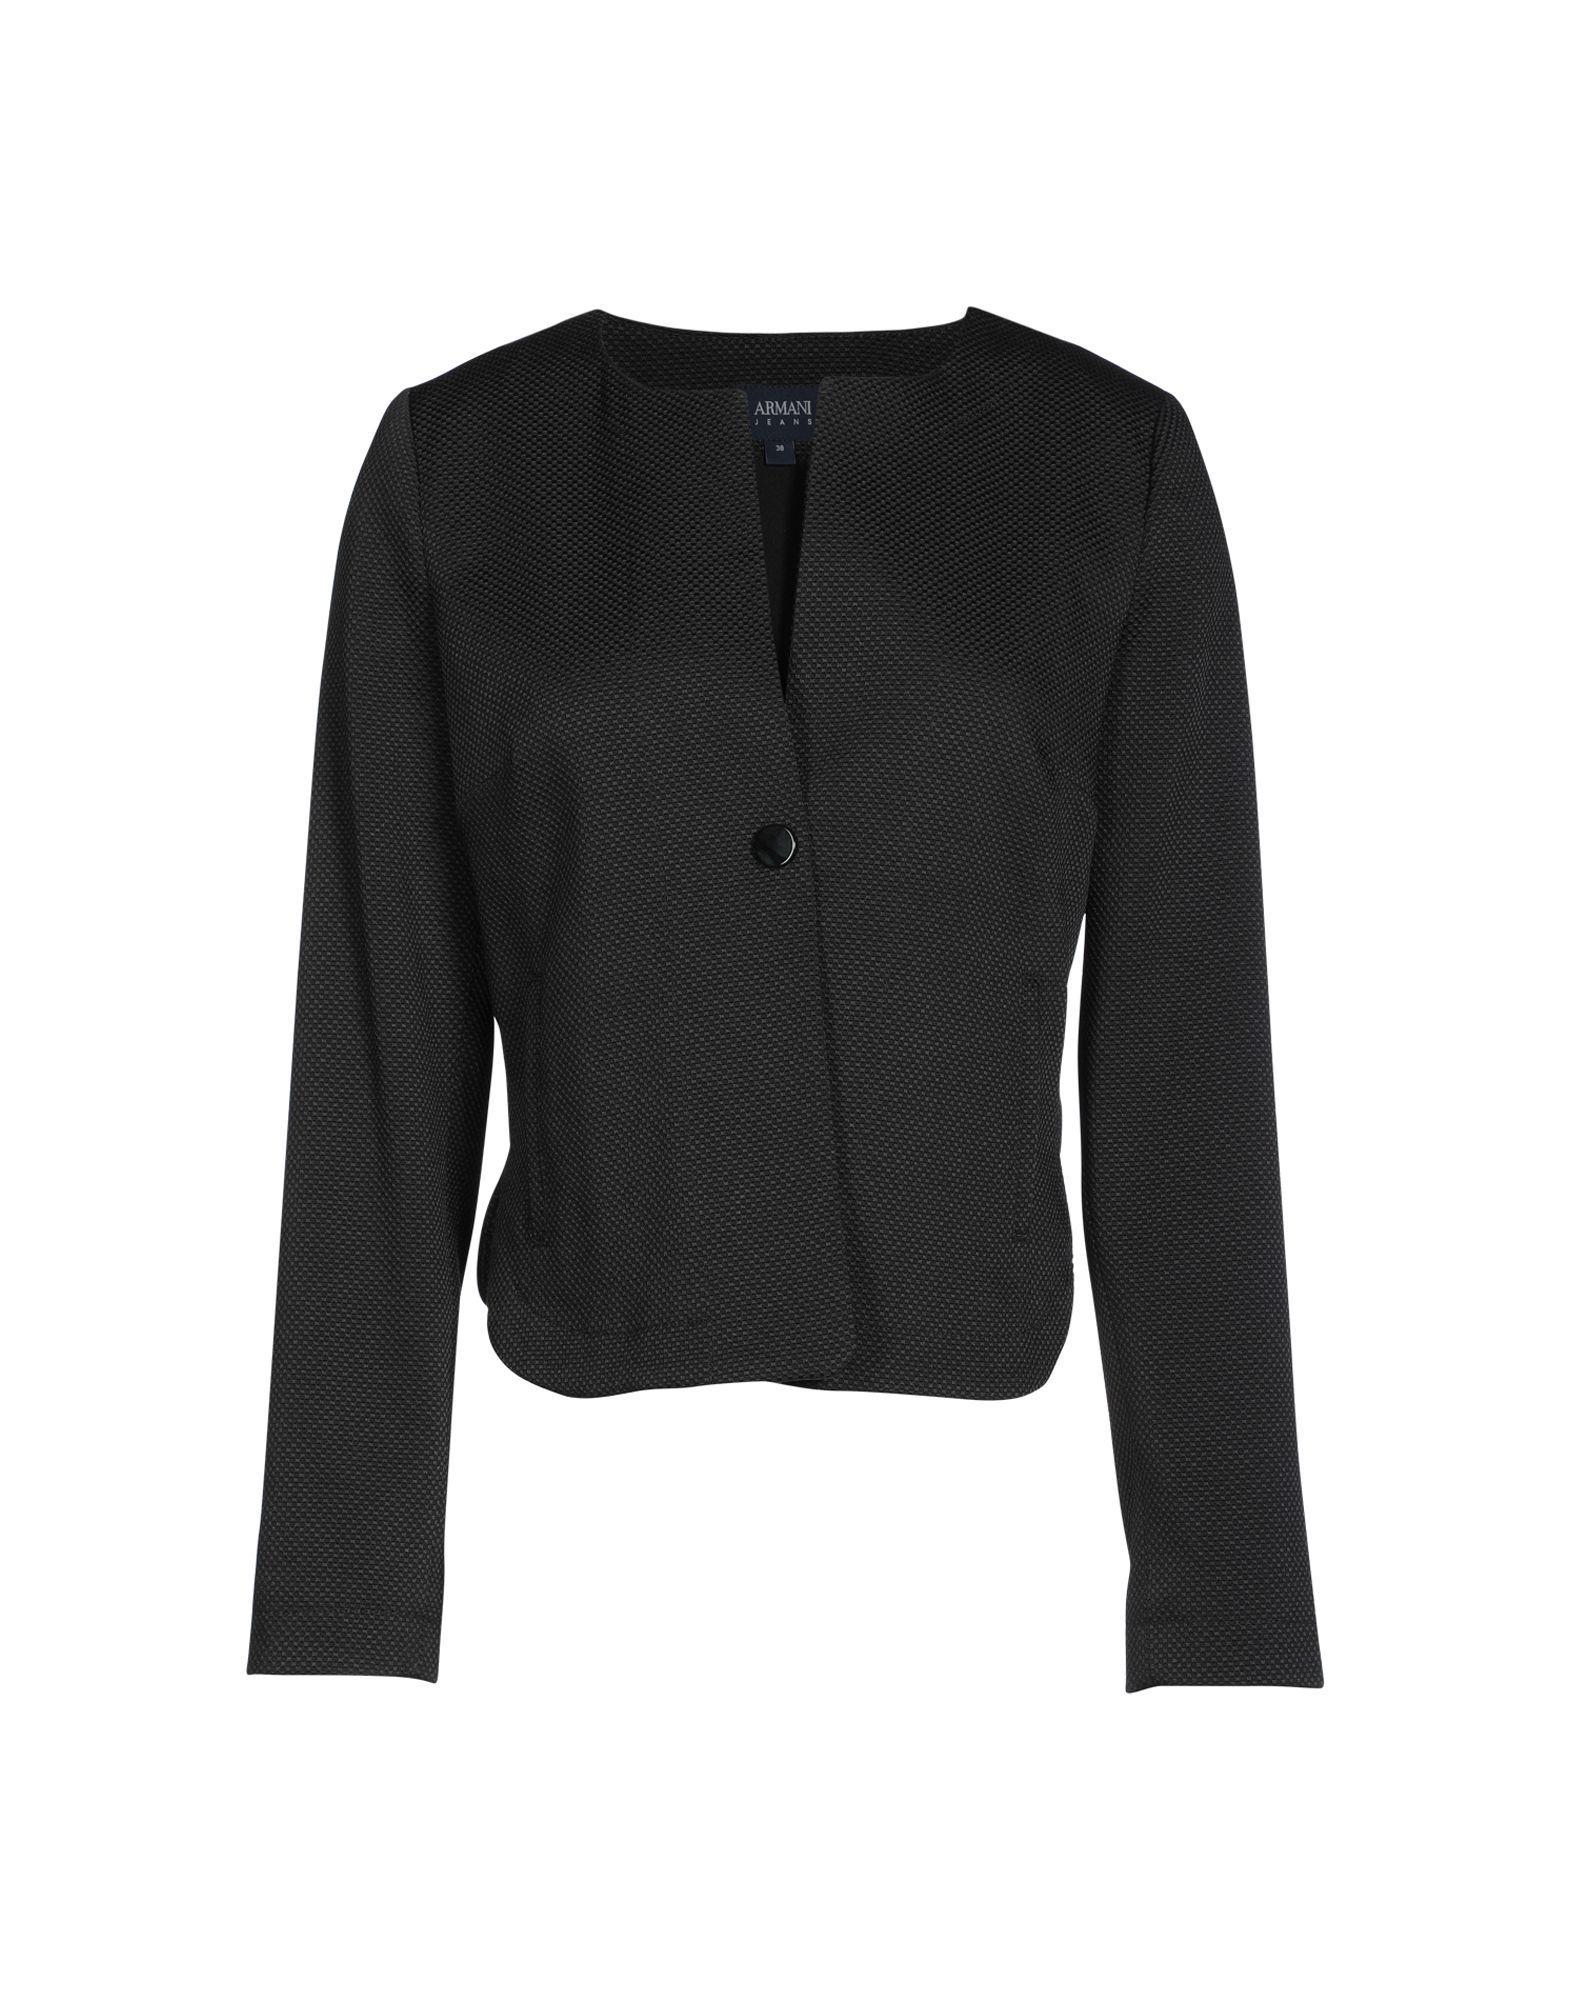 Armani Jeans Blazers In Black